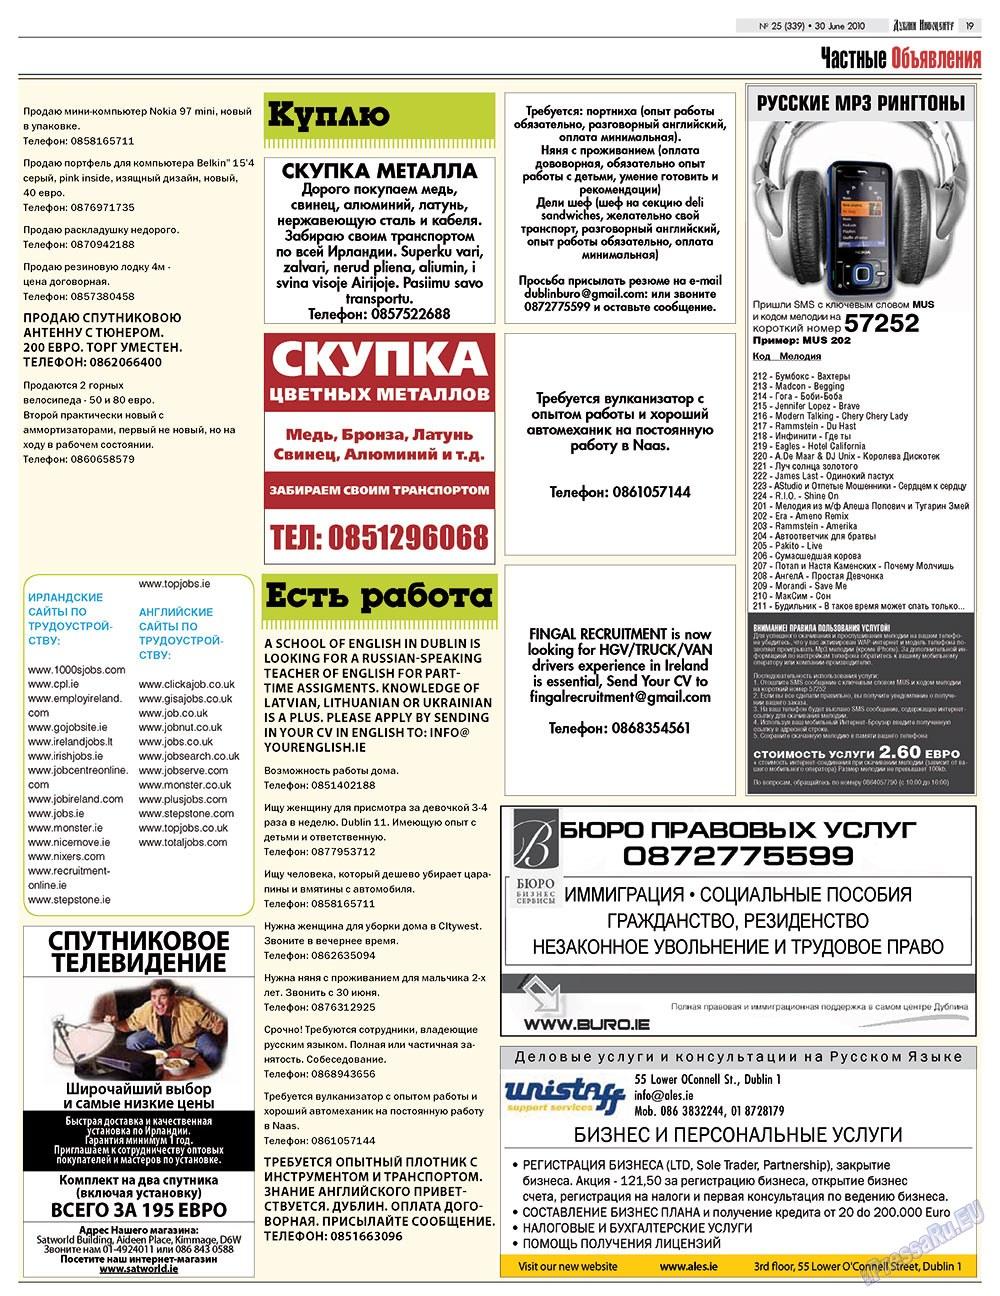 Дублин инфоцентр (газета). 2010 год, номер 25, стр. 19